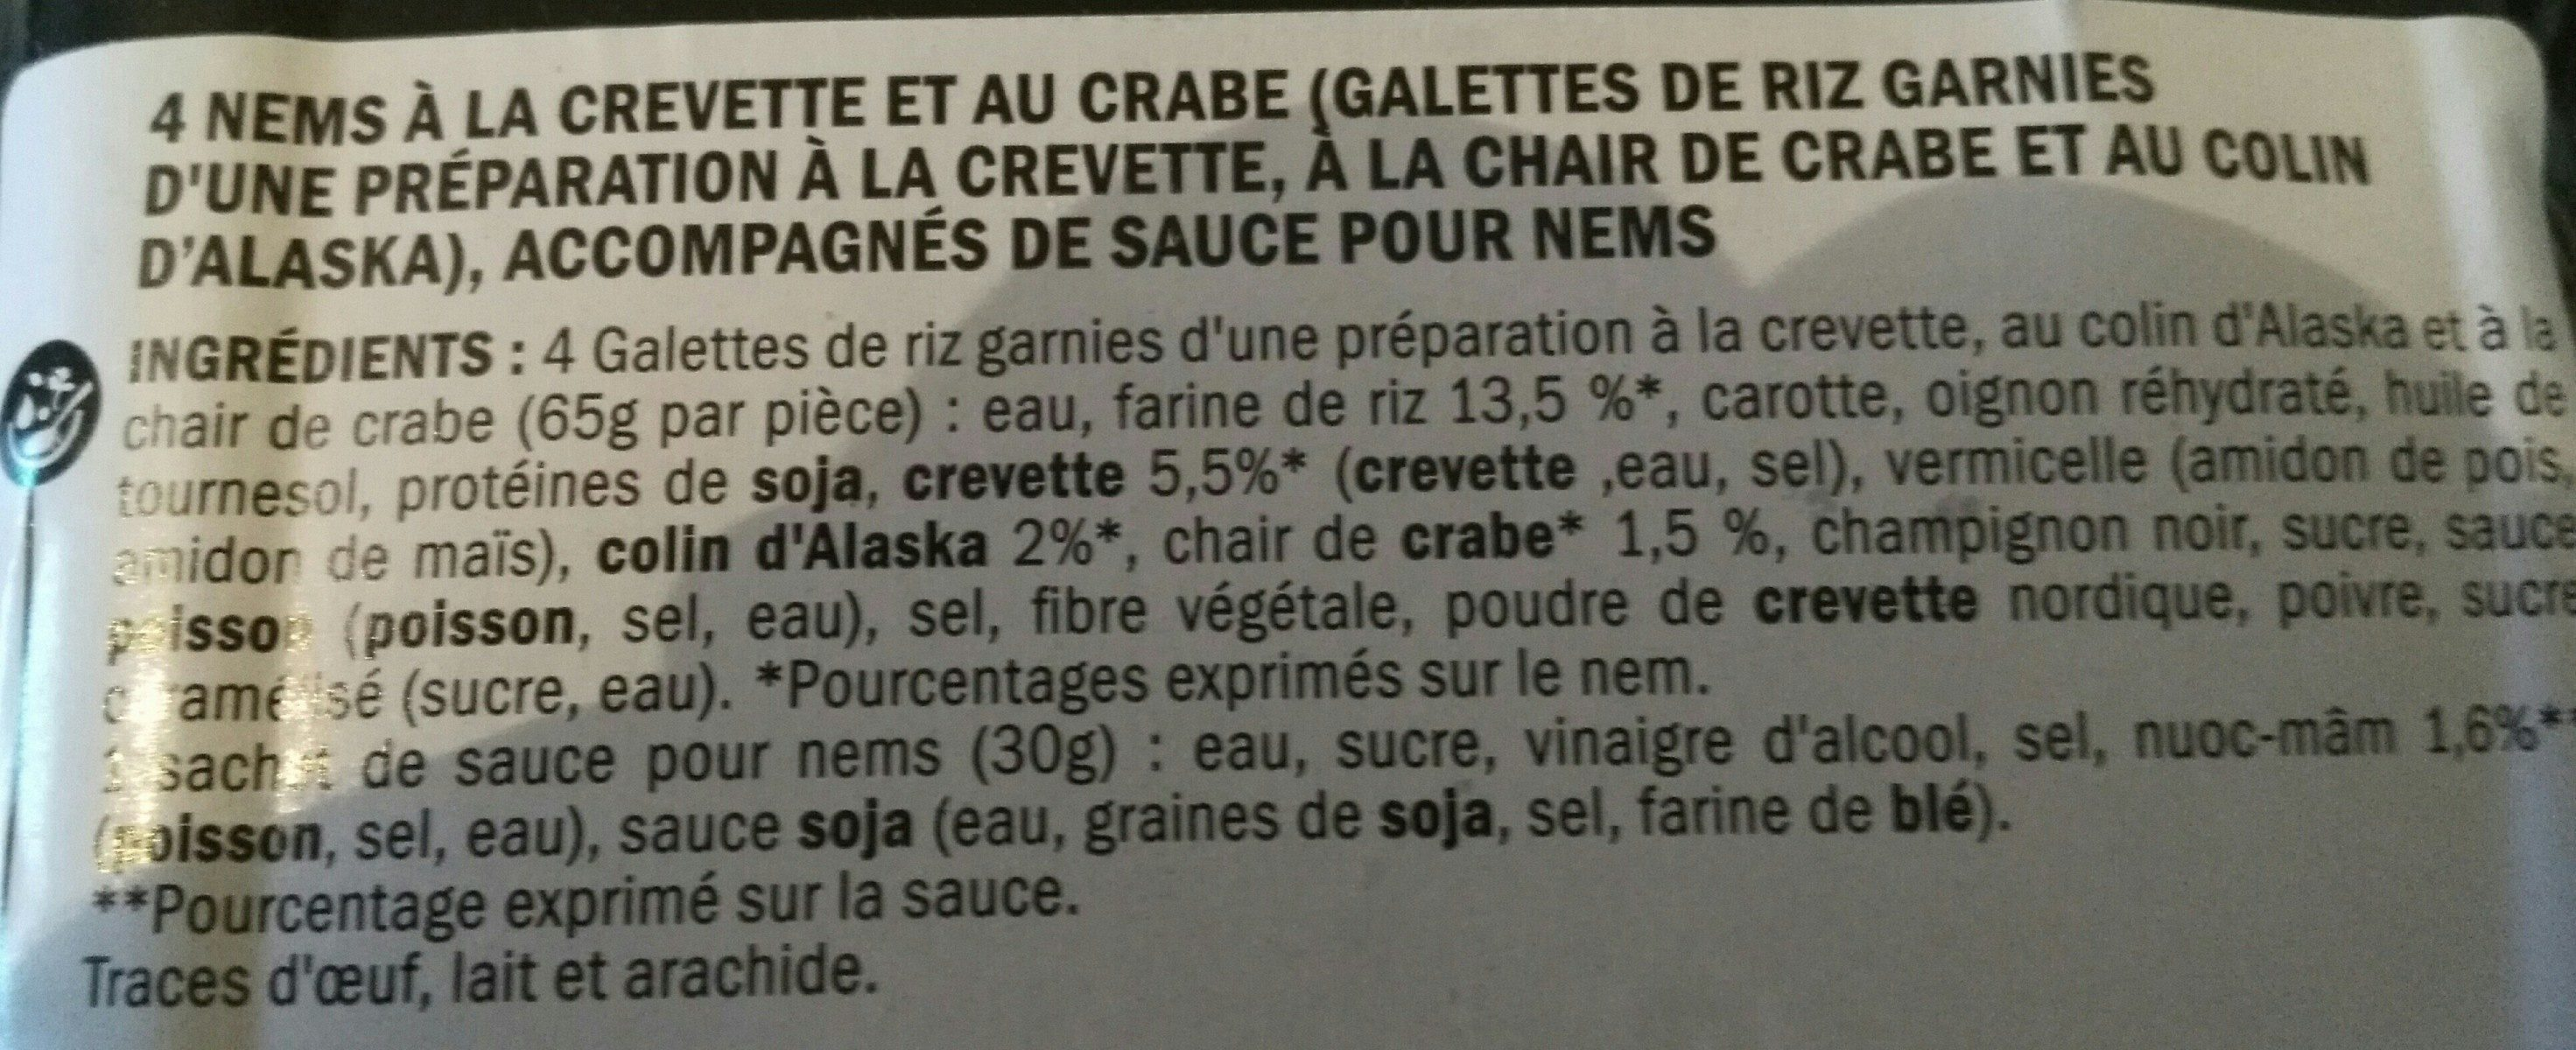 4 nems crevettes-crabe - Ingredients